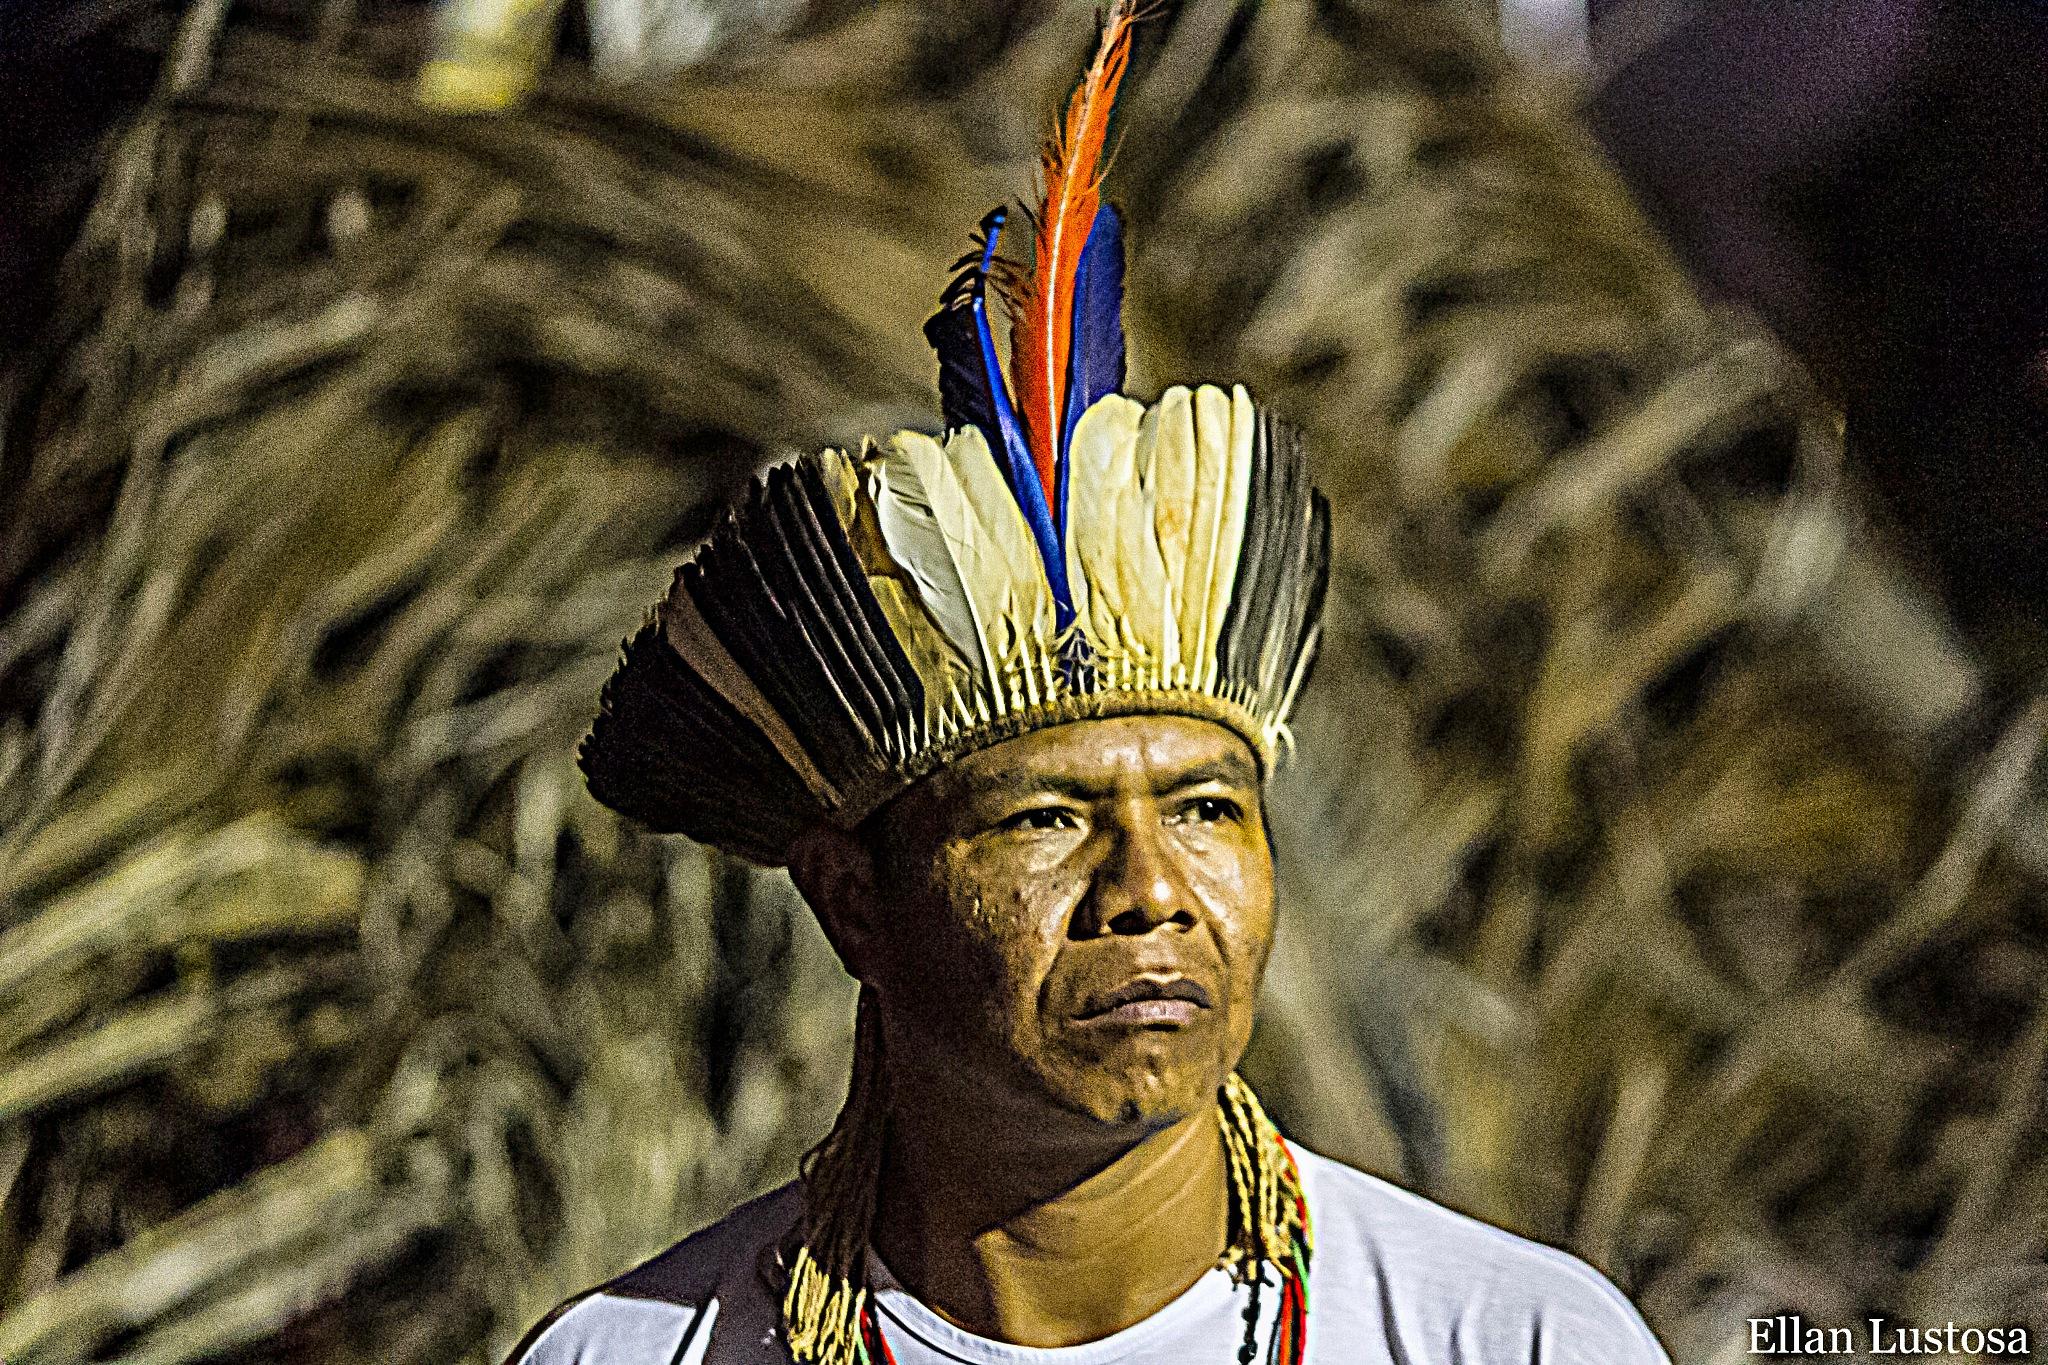 BRAZIL INDIAN by Ellan Lustosa Photojournalist